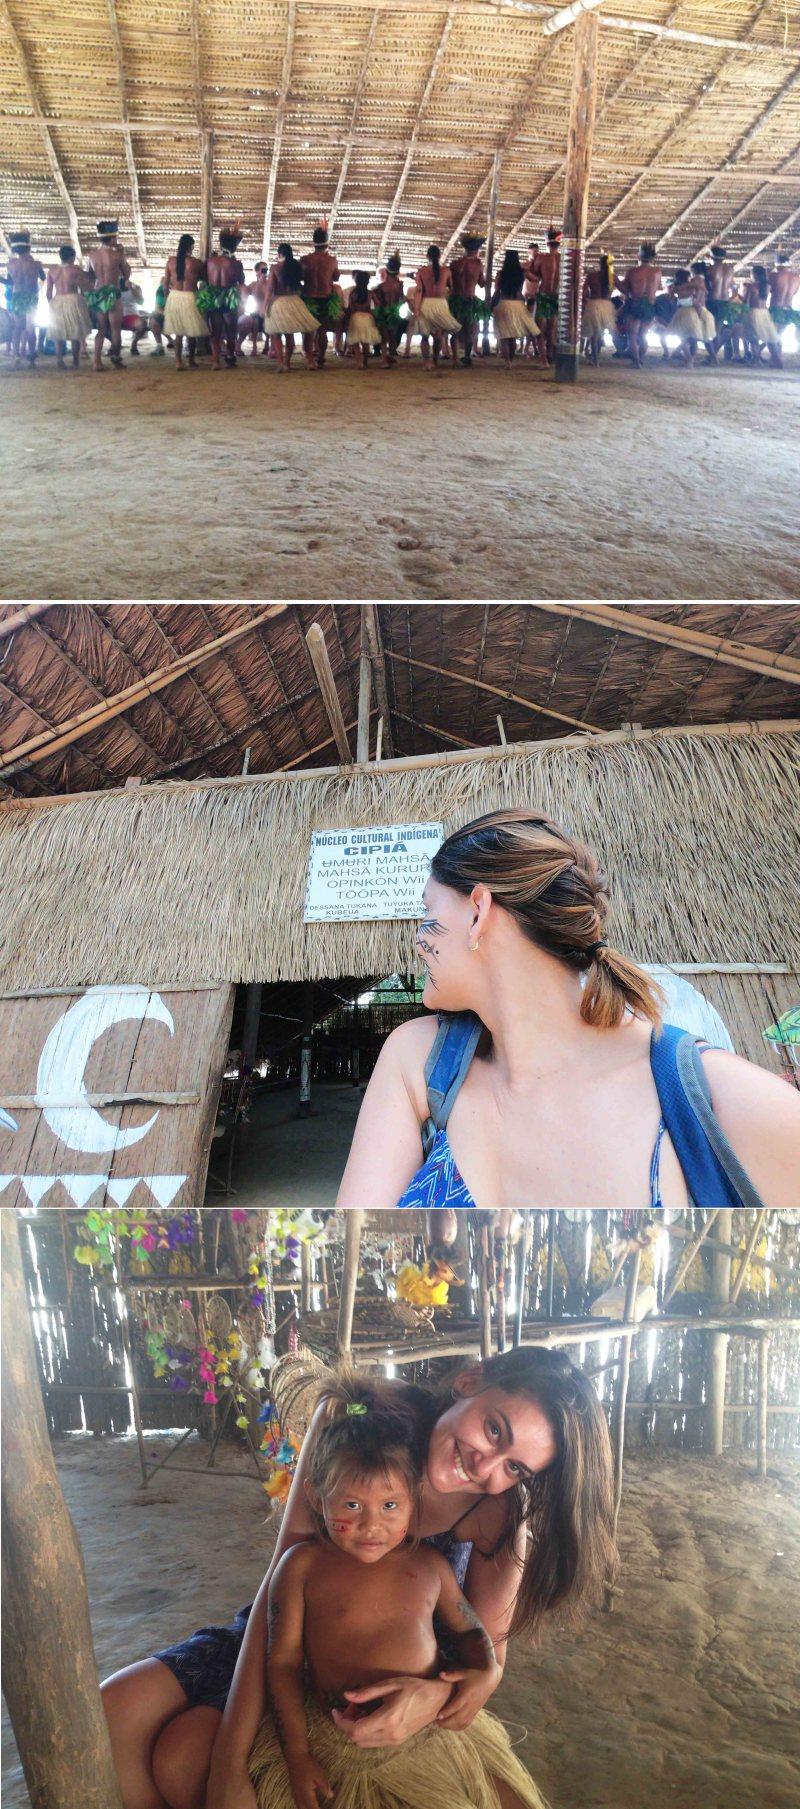 visita a aldeia indígena em manaus